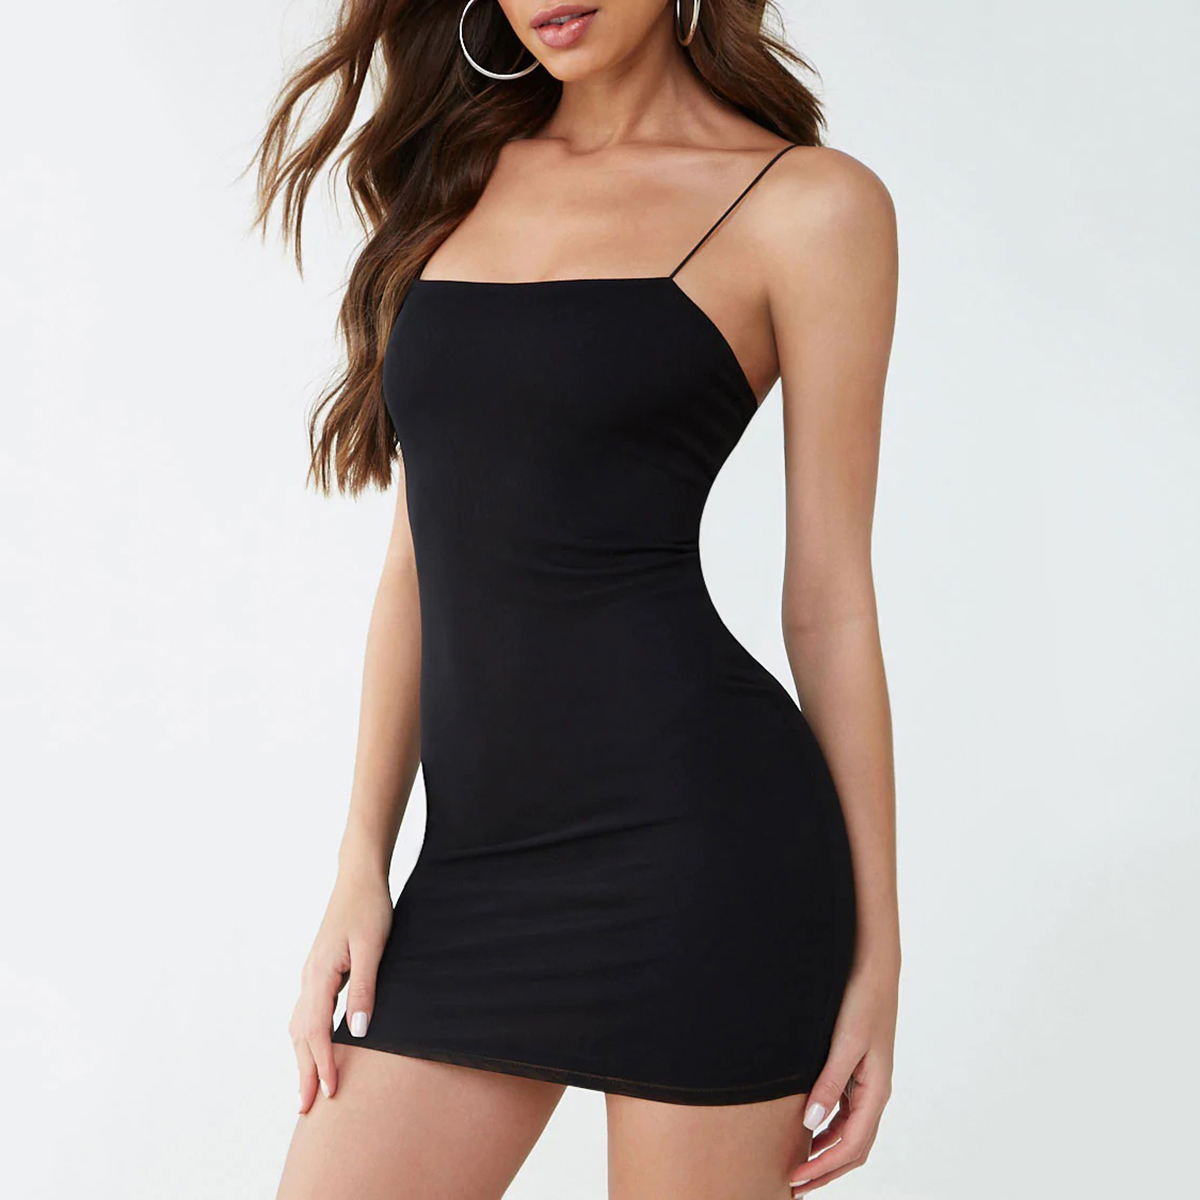 Black Sexy Dress Spaghetti Strap платье Female High Waist Sheath Club Dresses For Women Short Summer Mini Sleeveless Vestidos 4